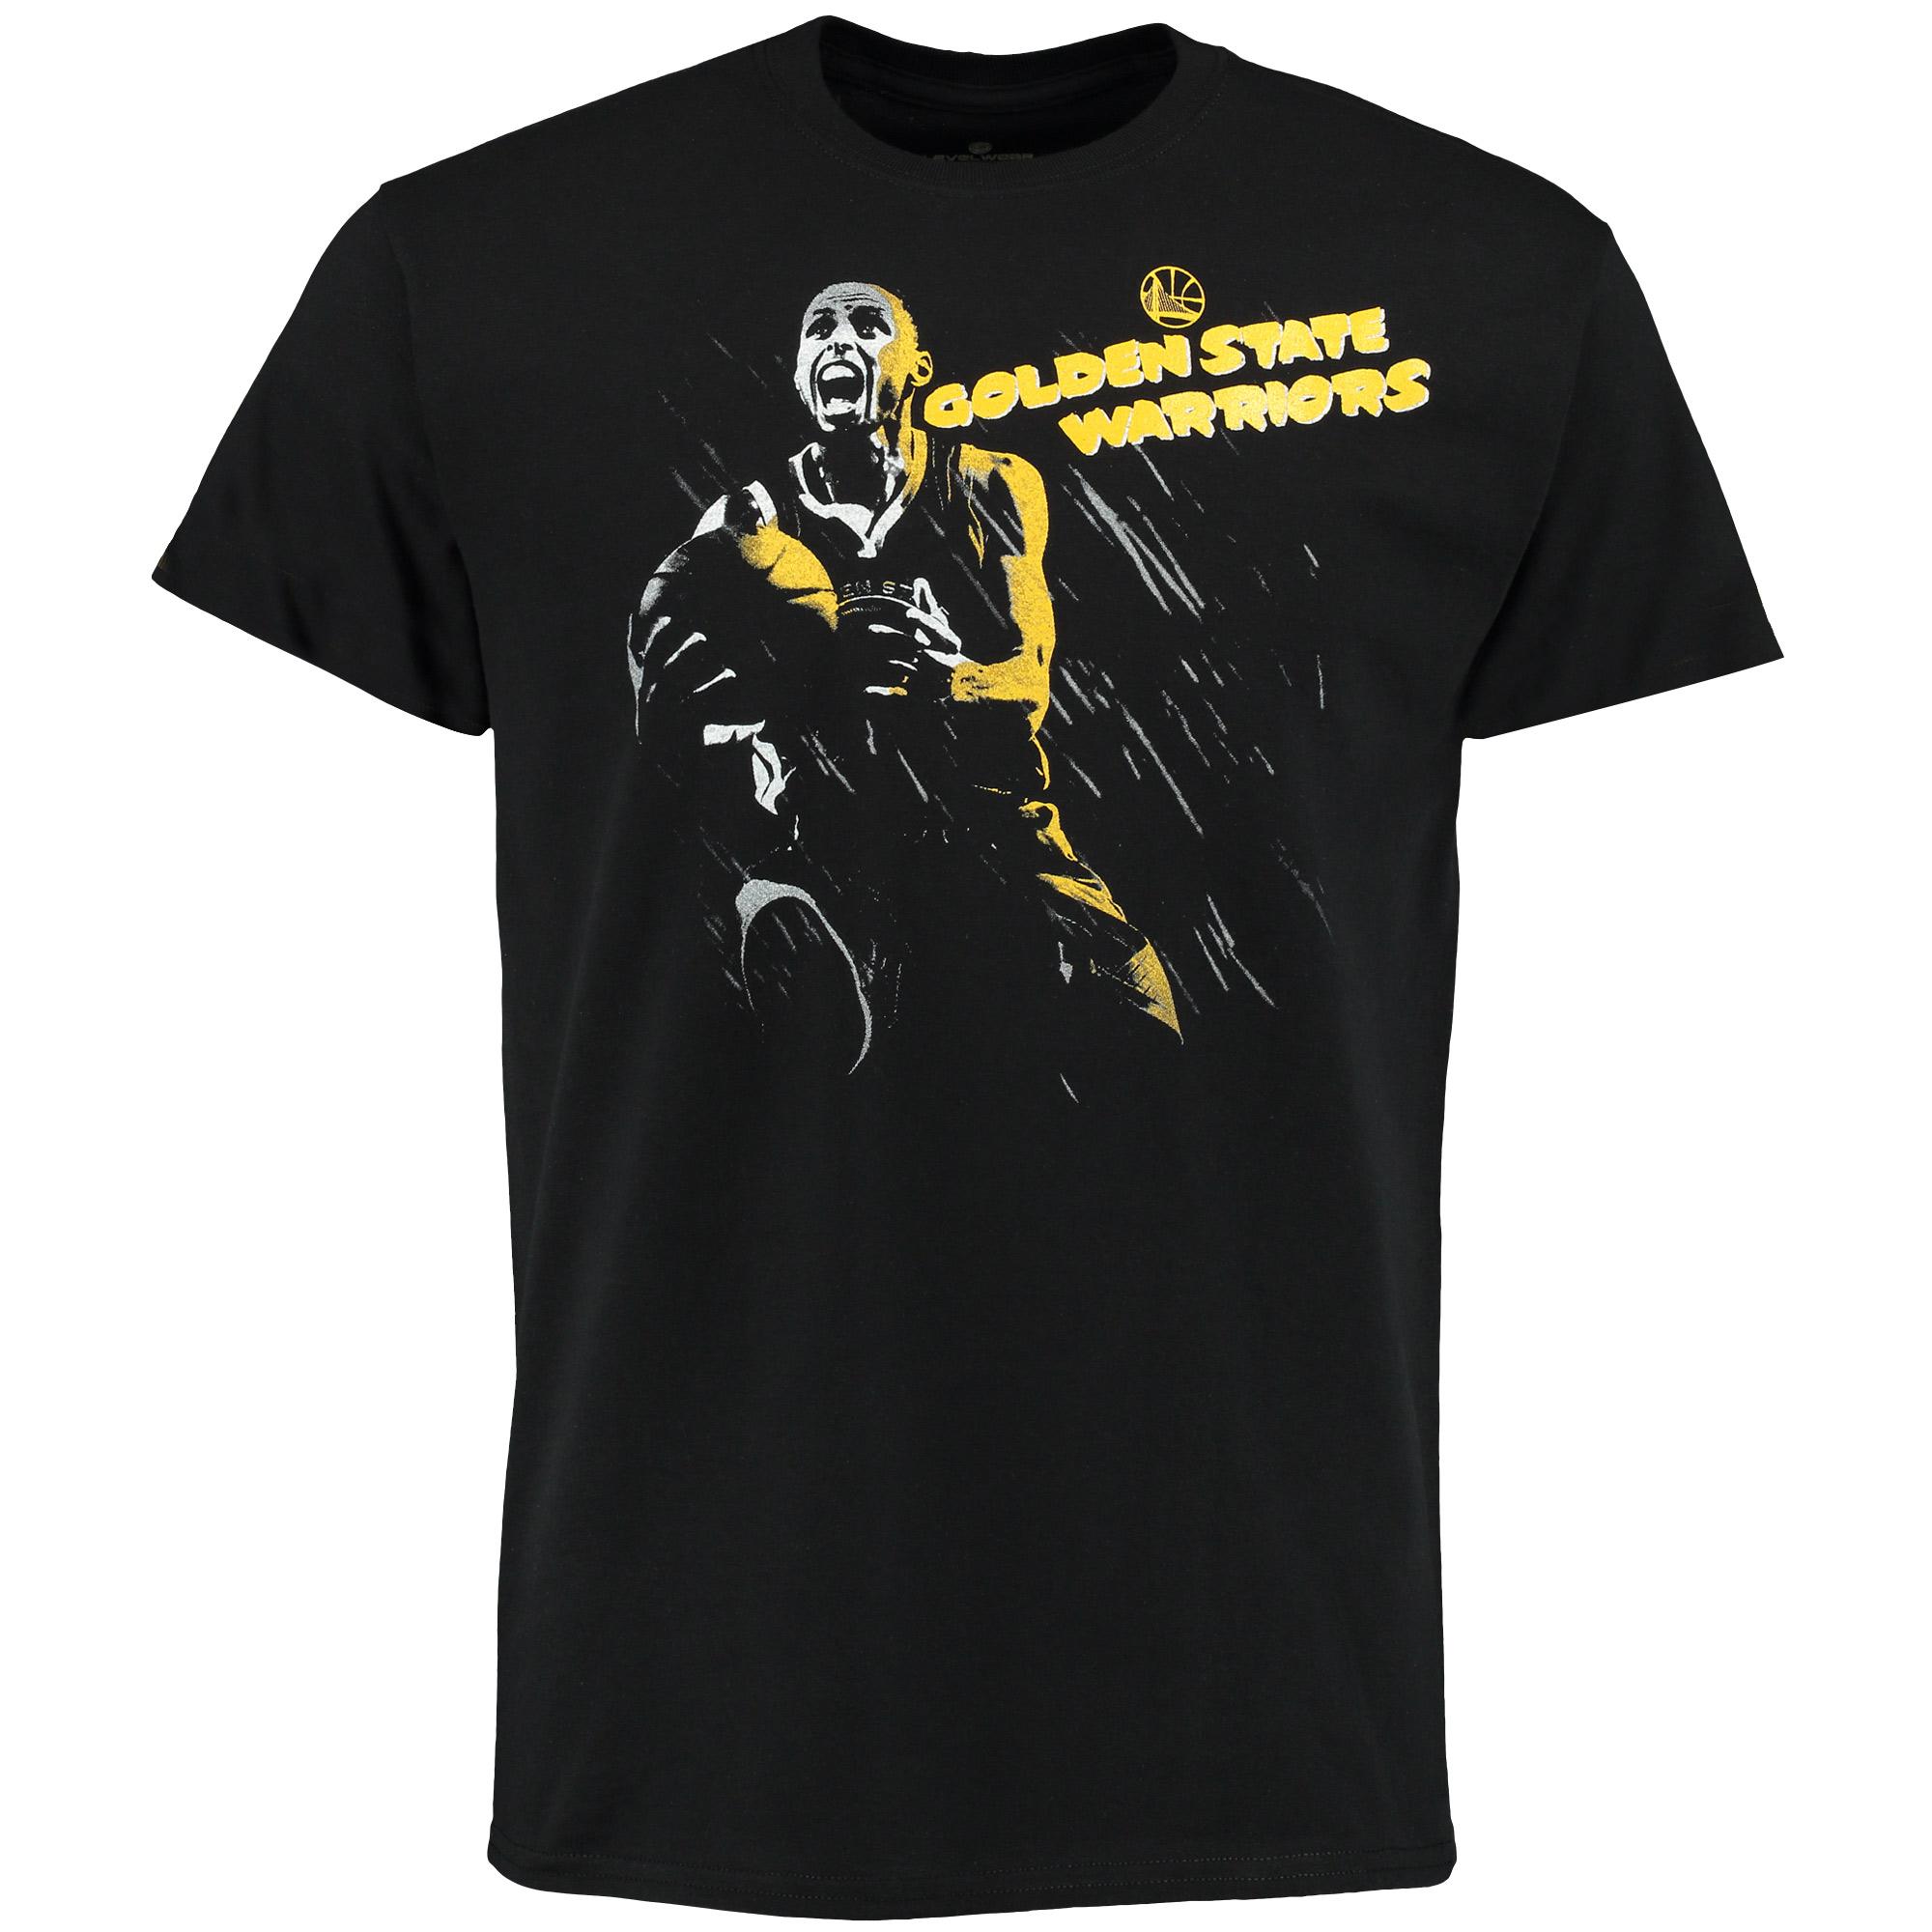 Stephen Curry Golden State Warriors Levelwear Sinister T-Shirt - Black